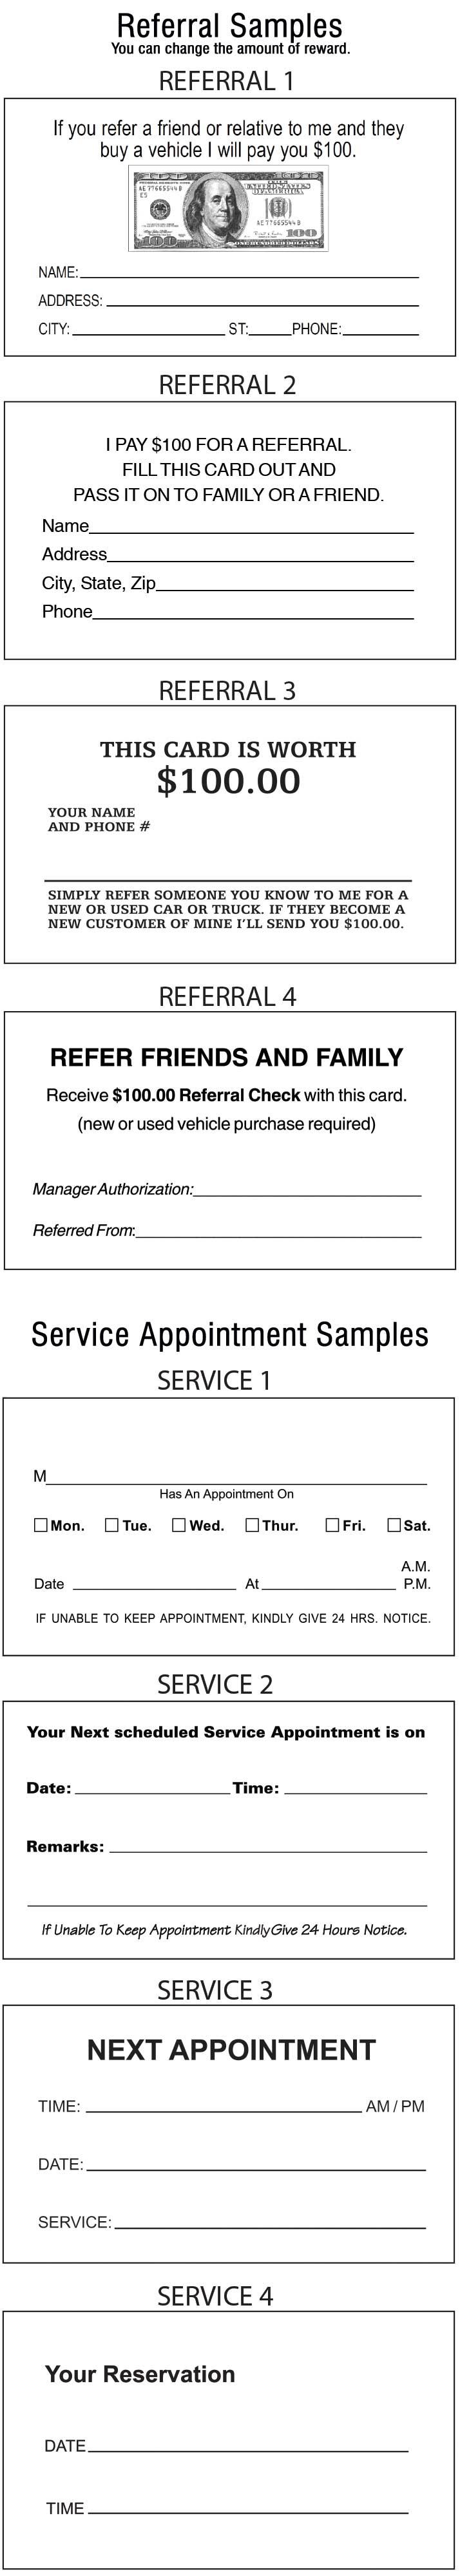 referral-svc-appt-samples-ss-102218.jpg